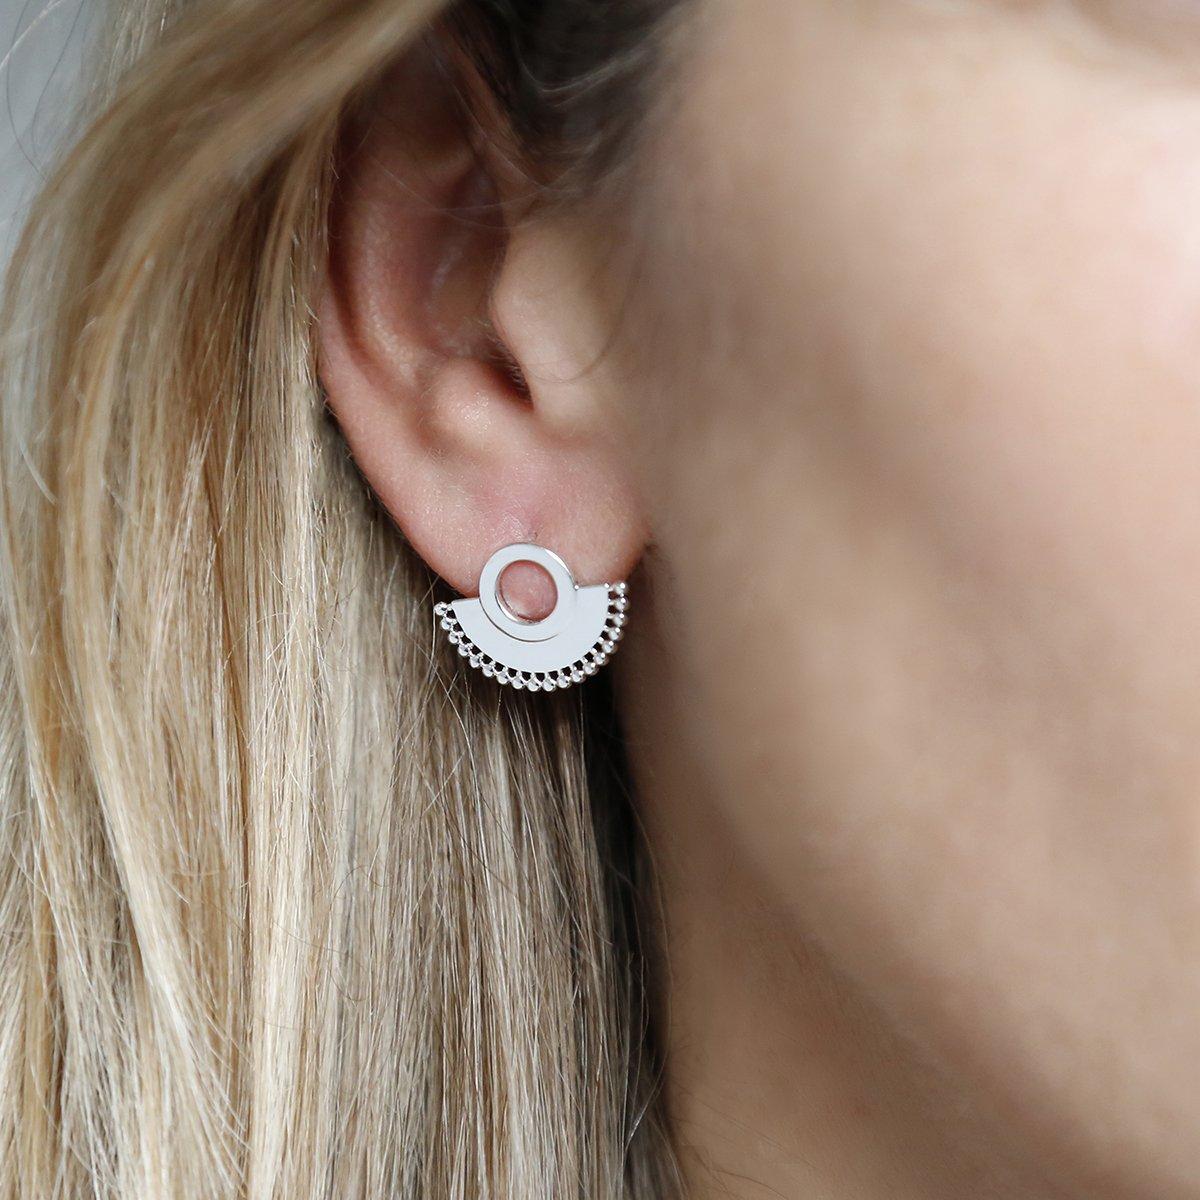 Sterling silver art deco sunburst stud earrings close up on great background on earlobe of model